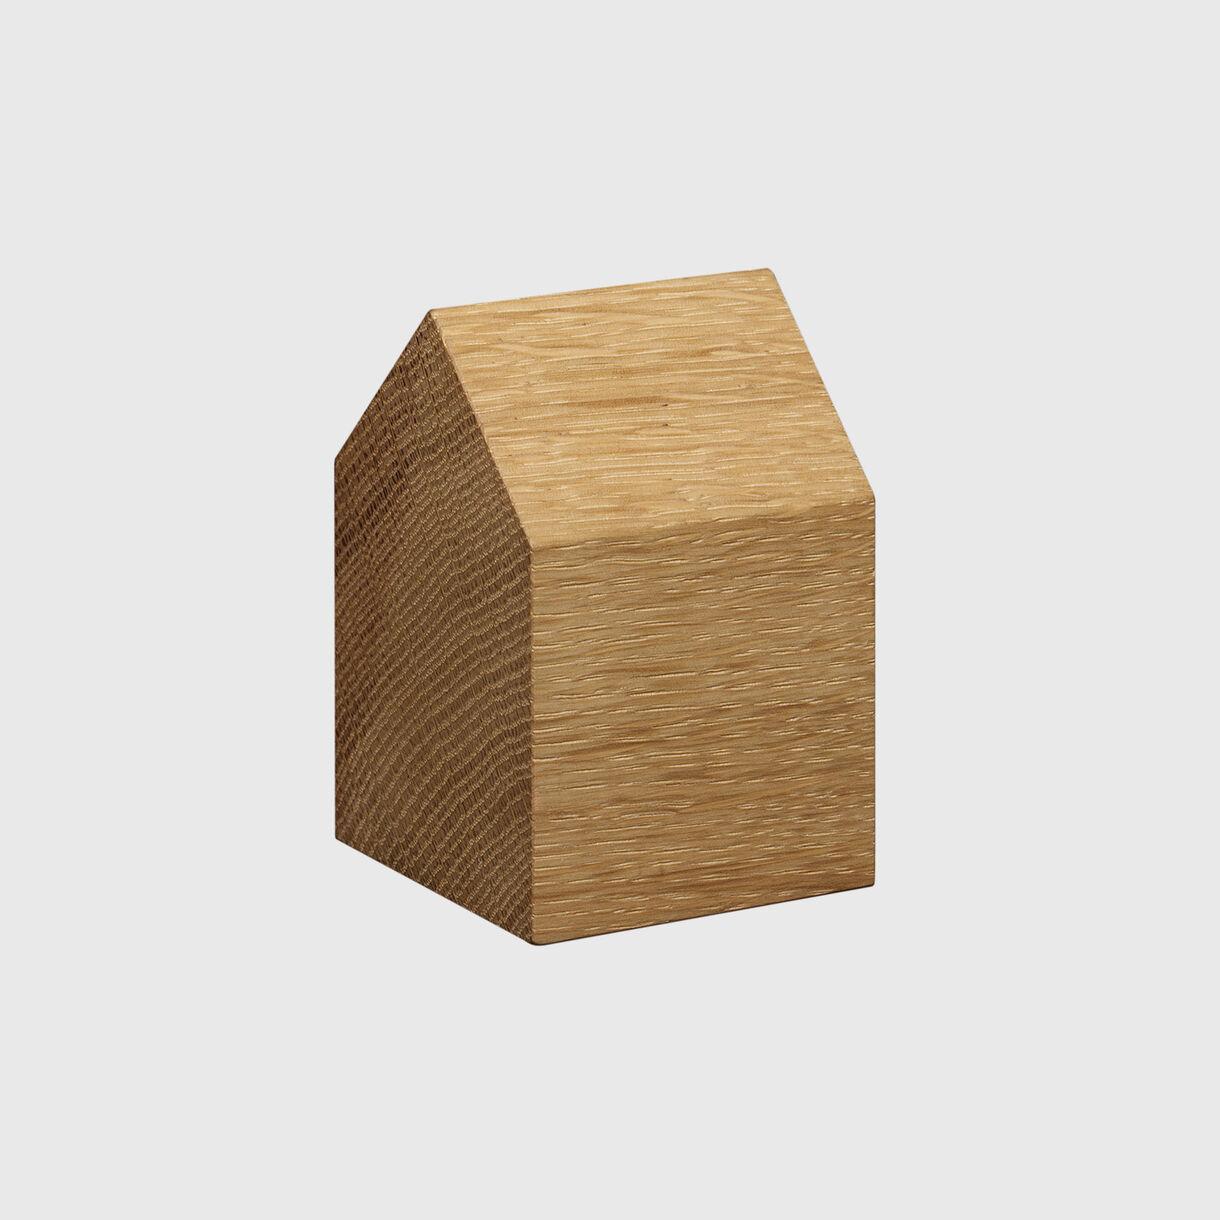 Haus Paper Weight, Saddle Small, European Oak